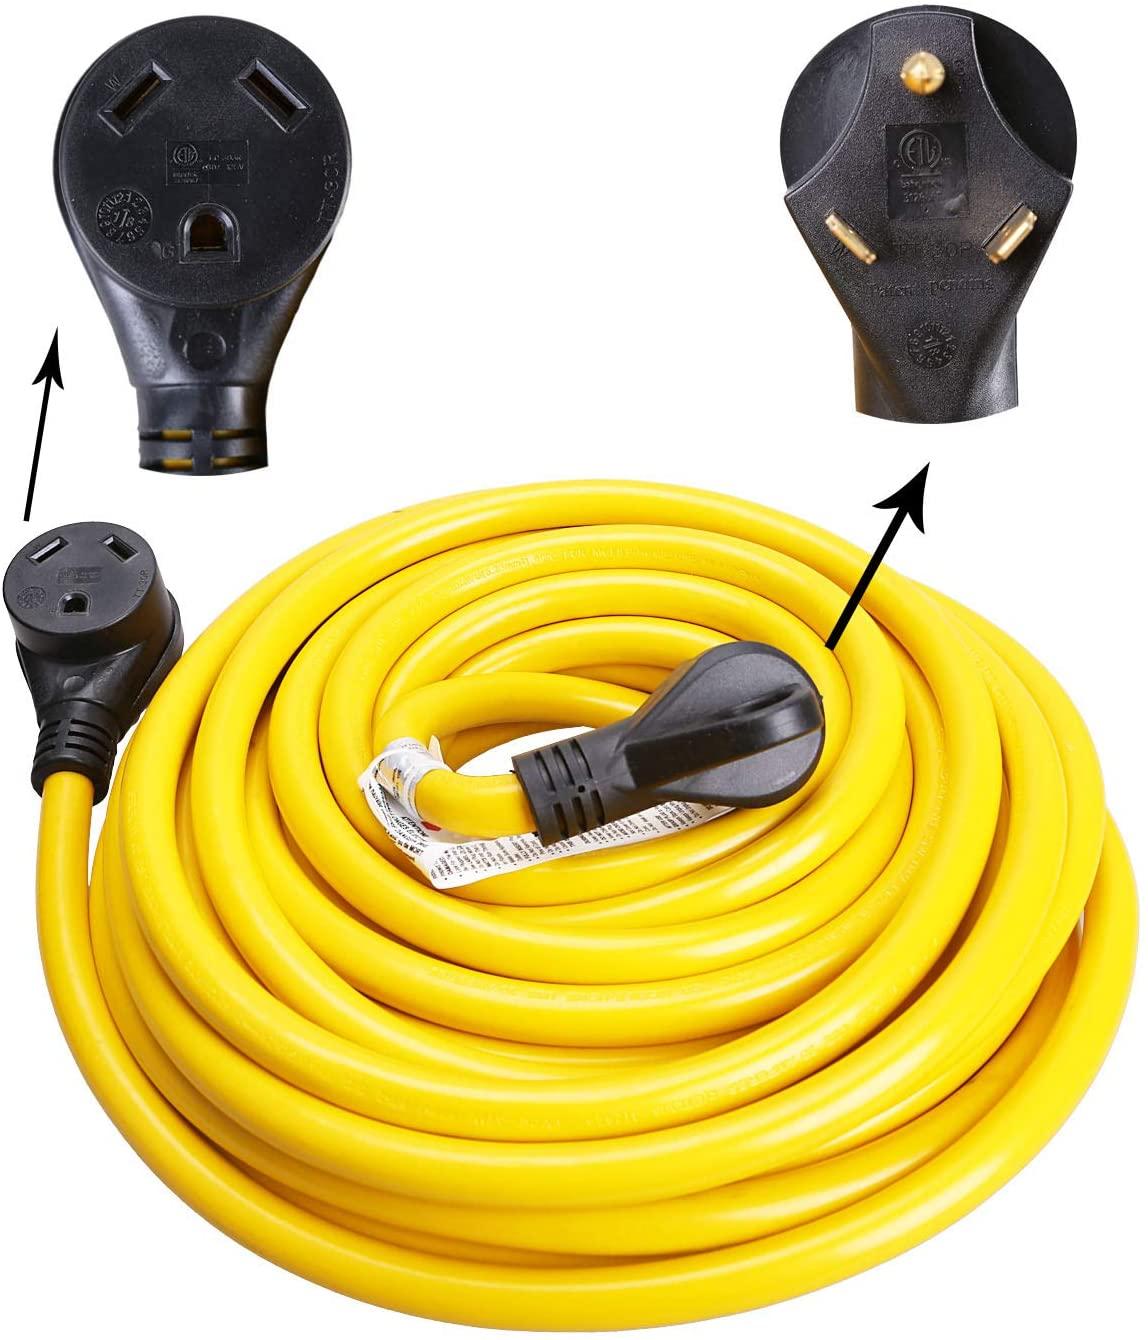 RV Extension Cord 30 Amp NEMA TT-30 RV/Generator Extension Cord with Handle, 25Foot(RV30-25FH)